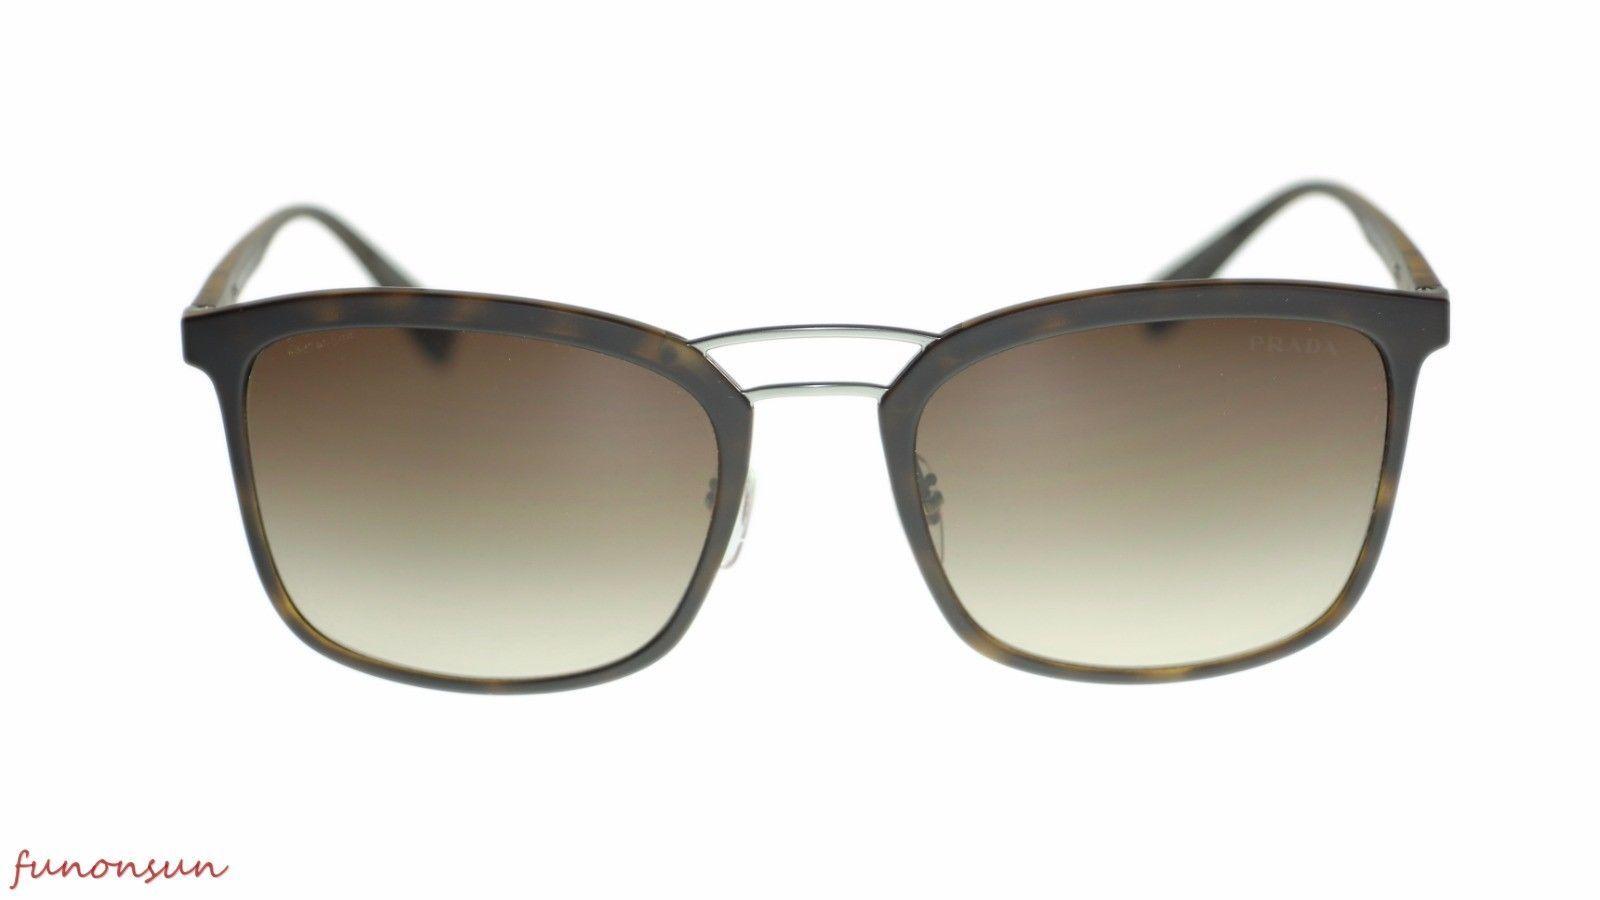 Prada Men's Sunglasses PS03SS U61S1 Havana Brown Gradient Lens 56mm